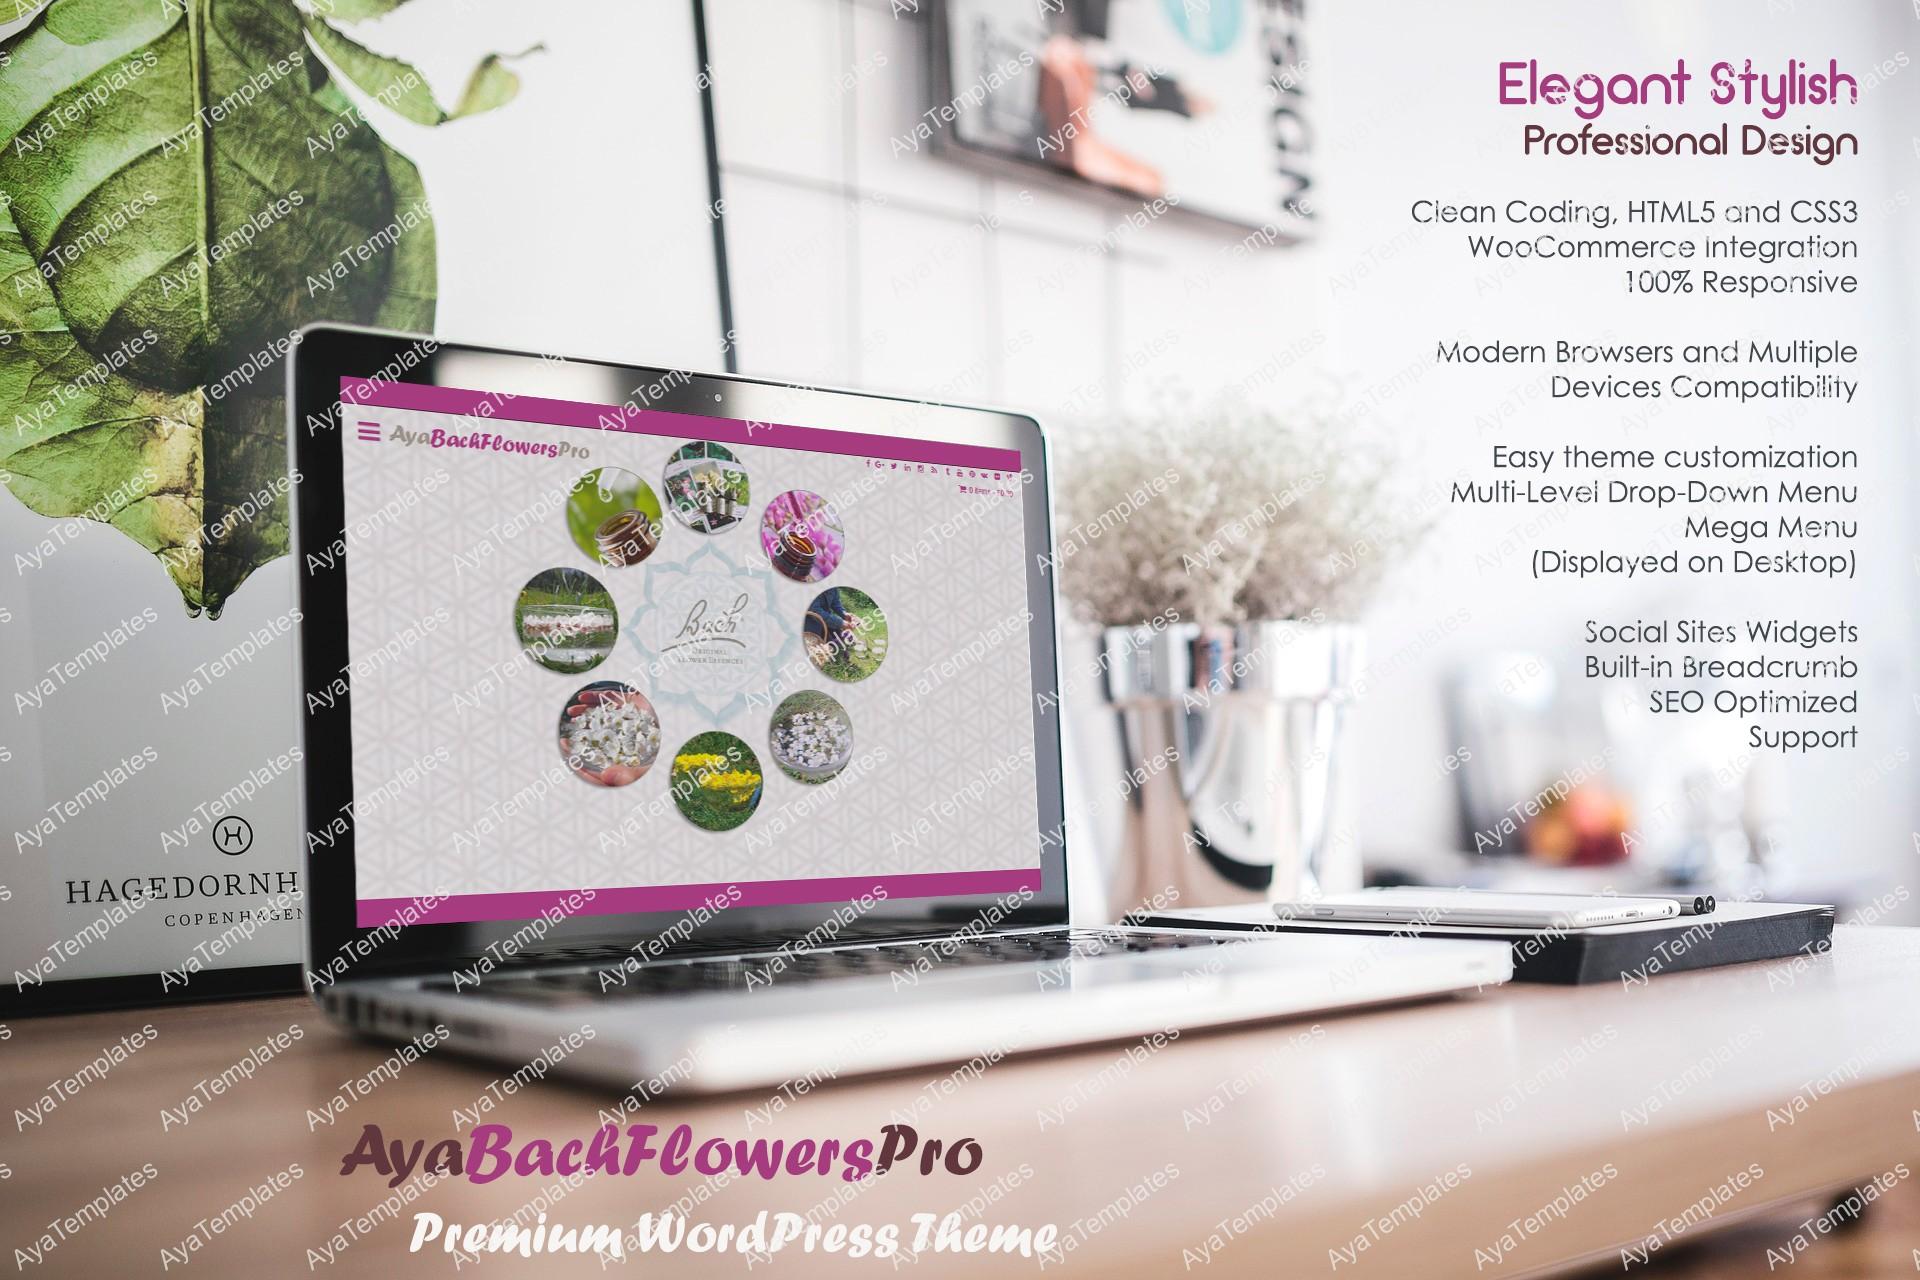 ayabachflowerspro-premium-wordpress-theme-mockup